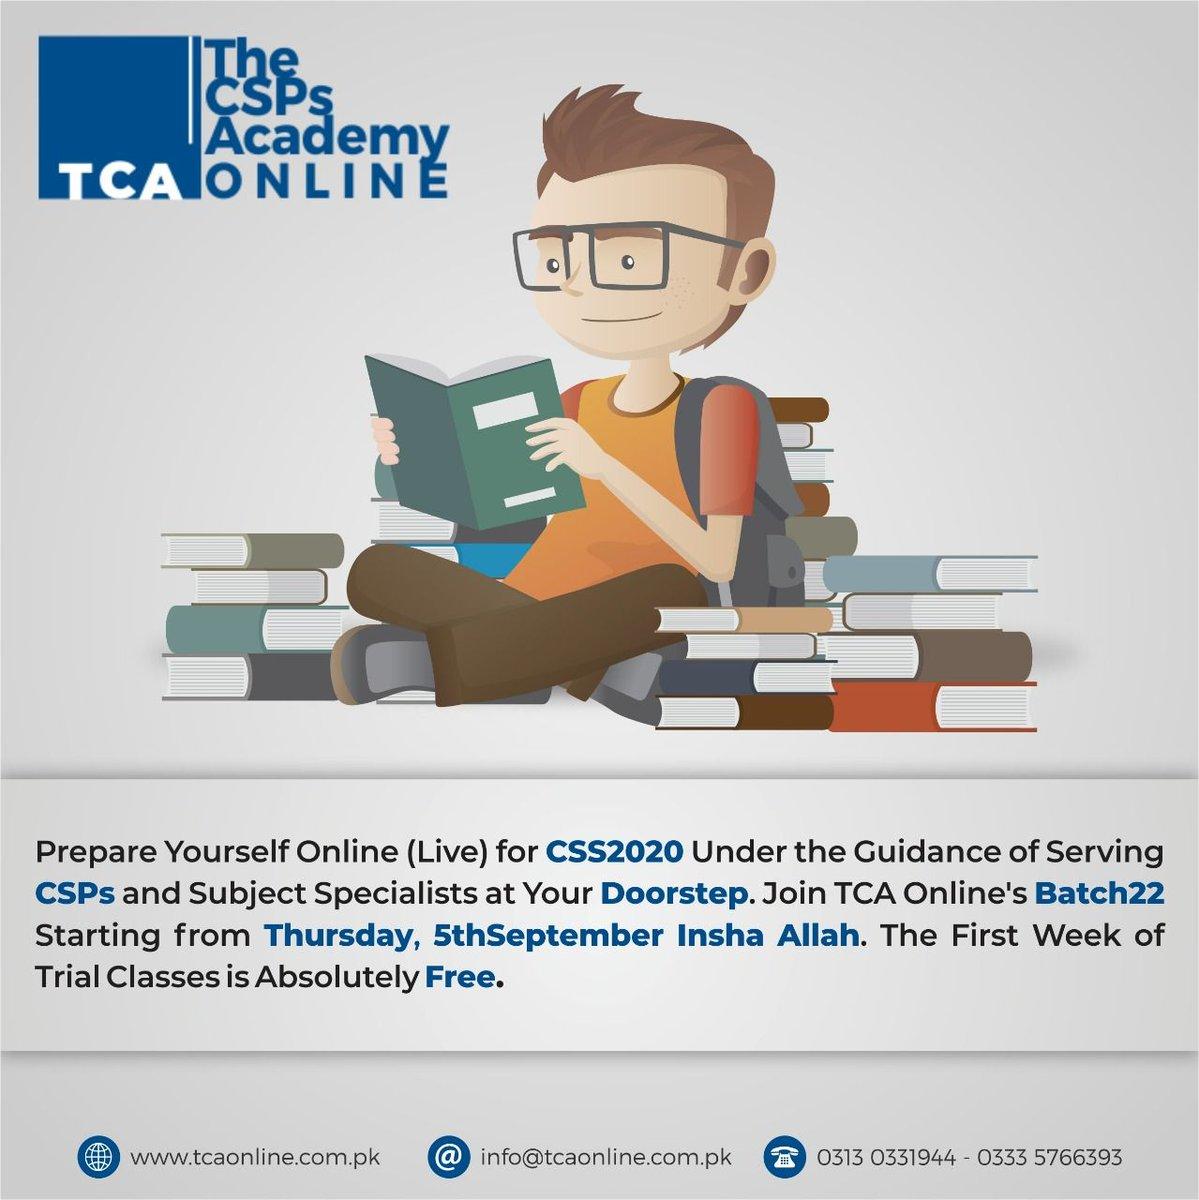 The CSPs Academy - Online (TCA Online) (@TheCSPsAcademy